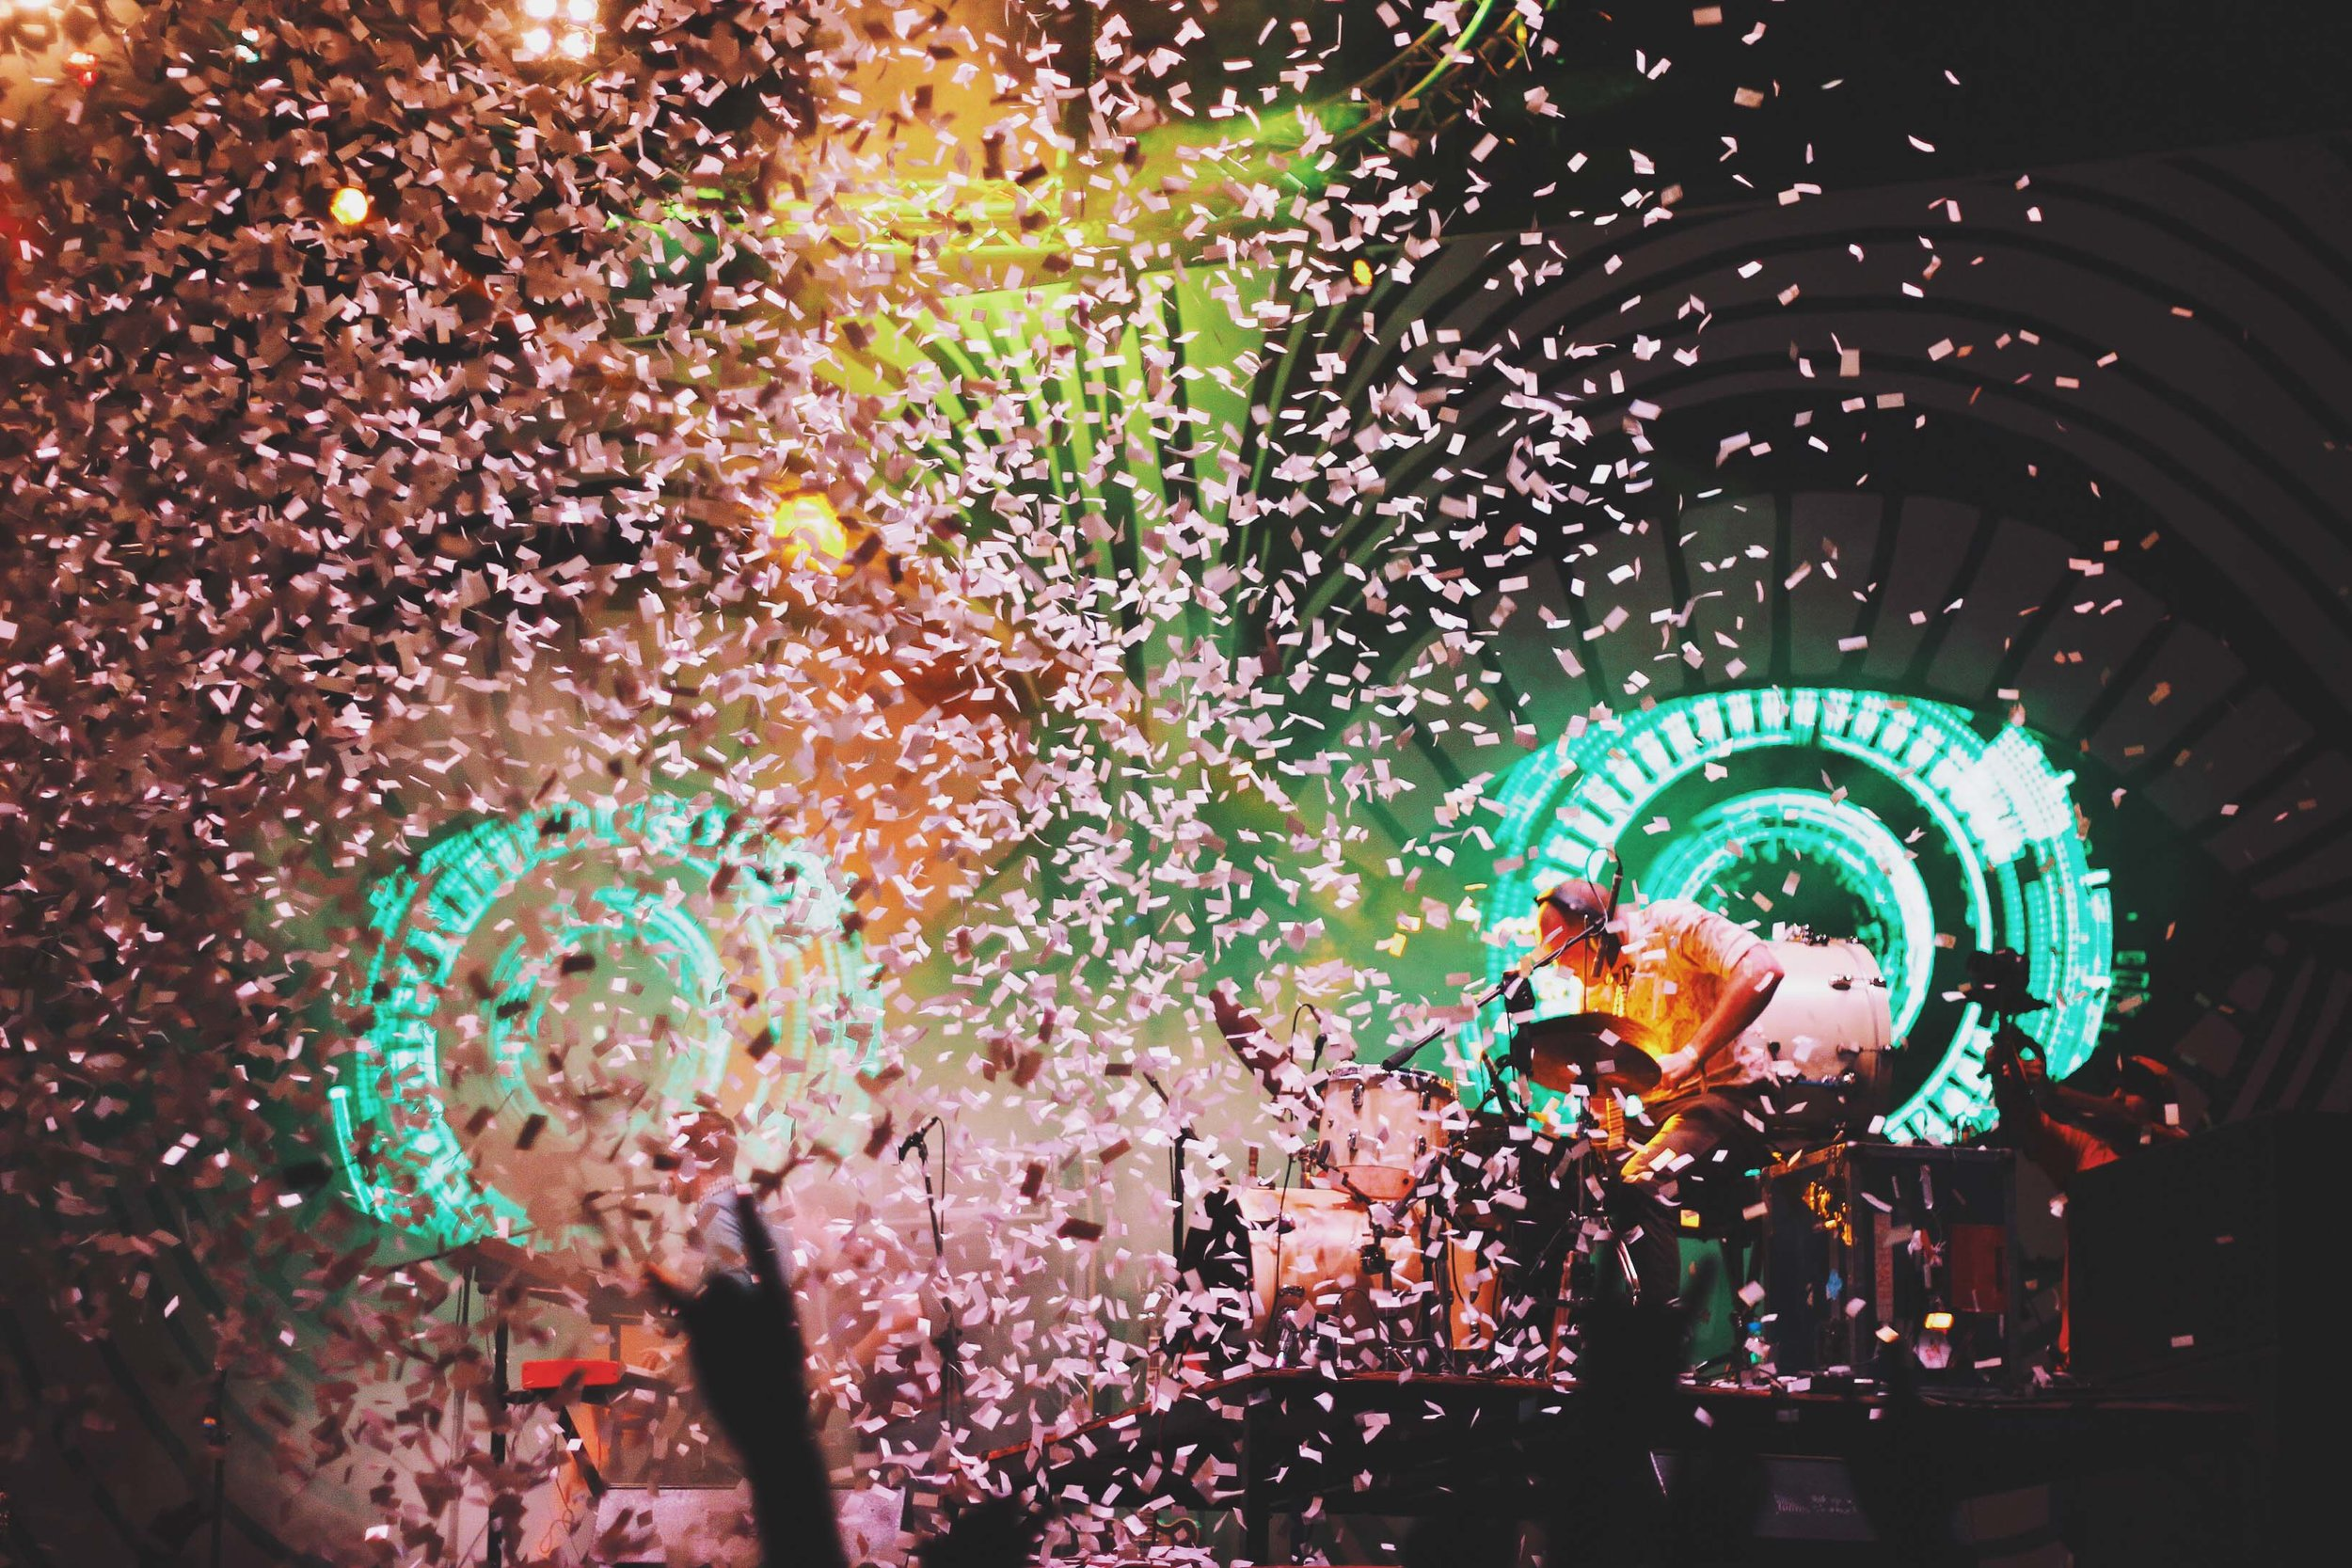 austin live music photo.jpeg